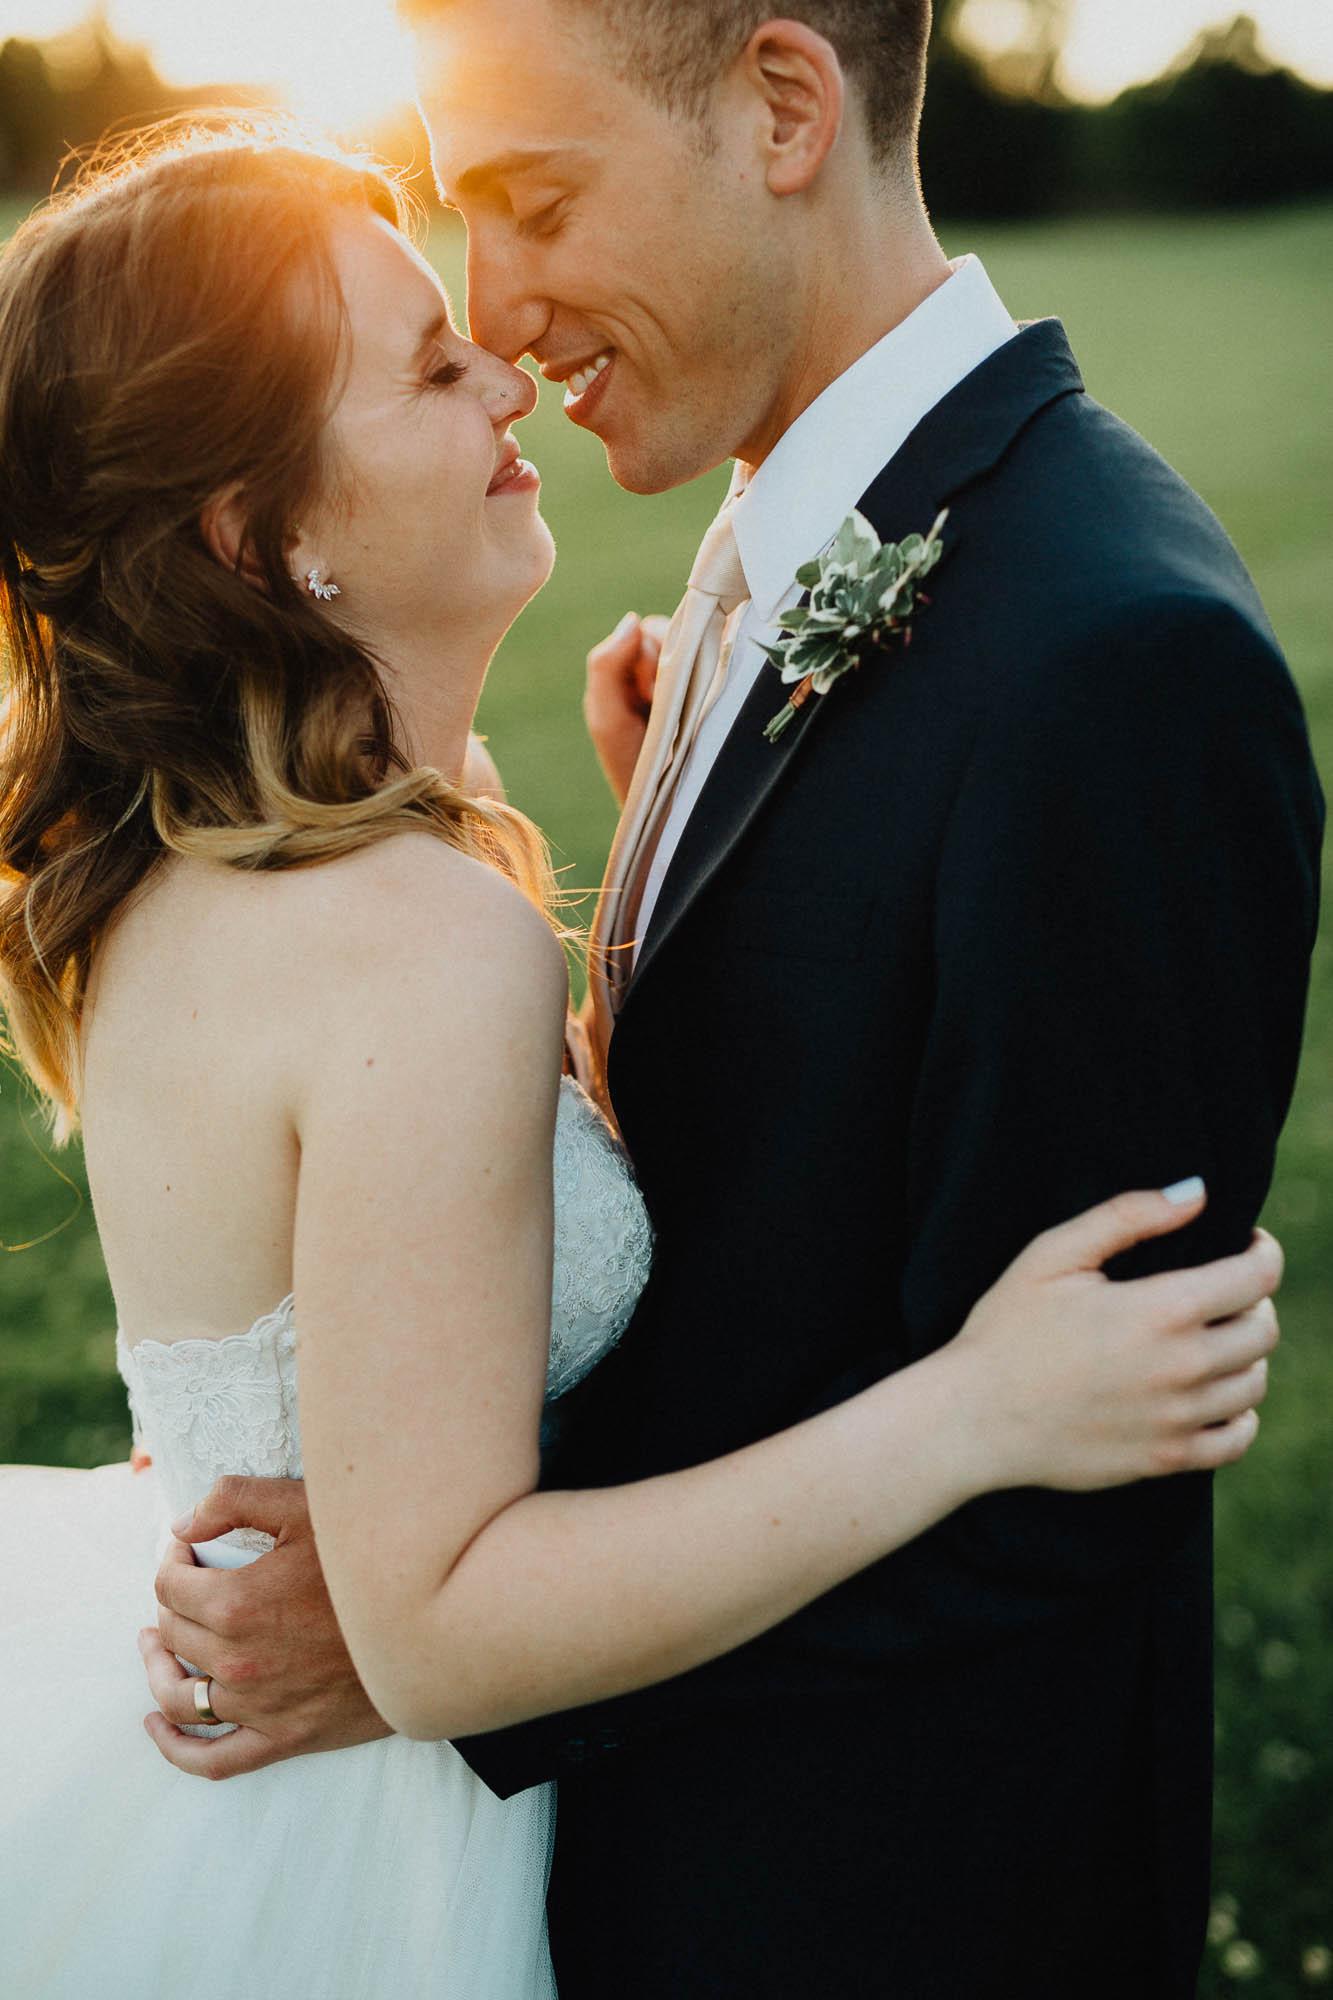 Sunset Portrait at a Columbus Ohio Wedding